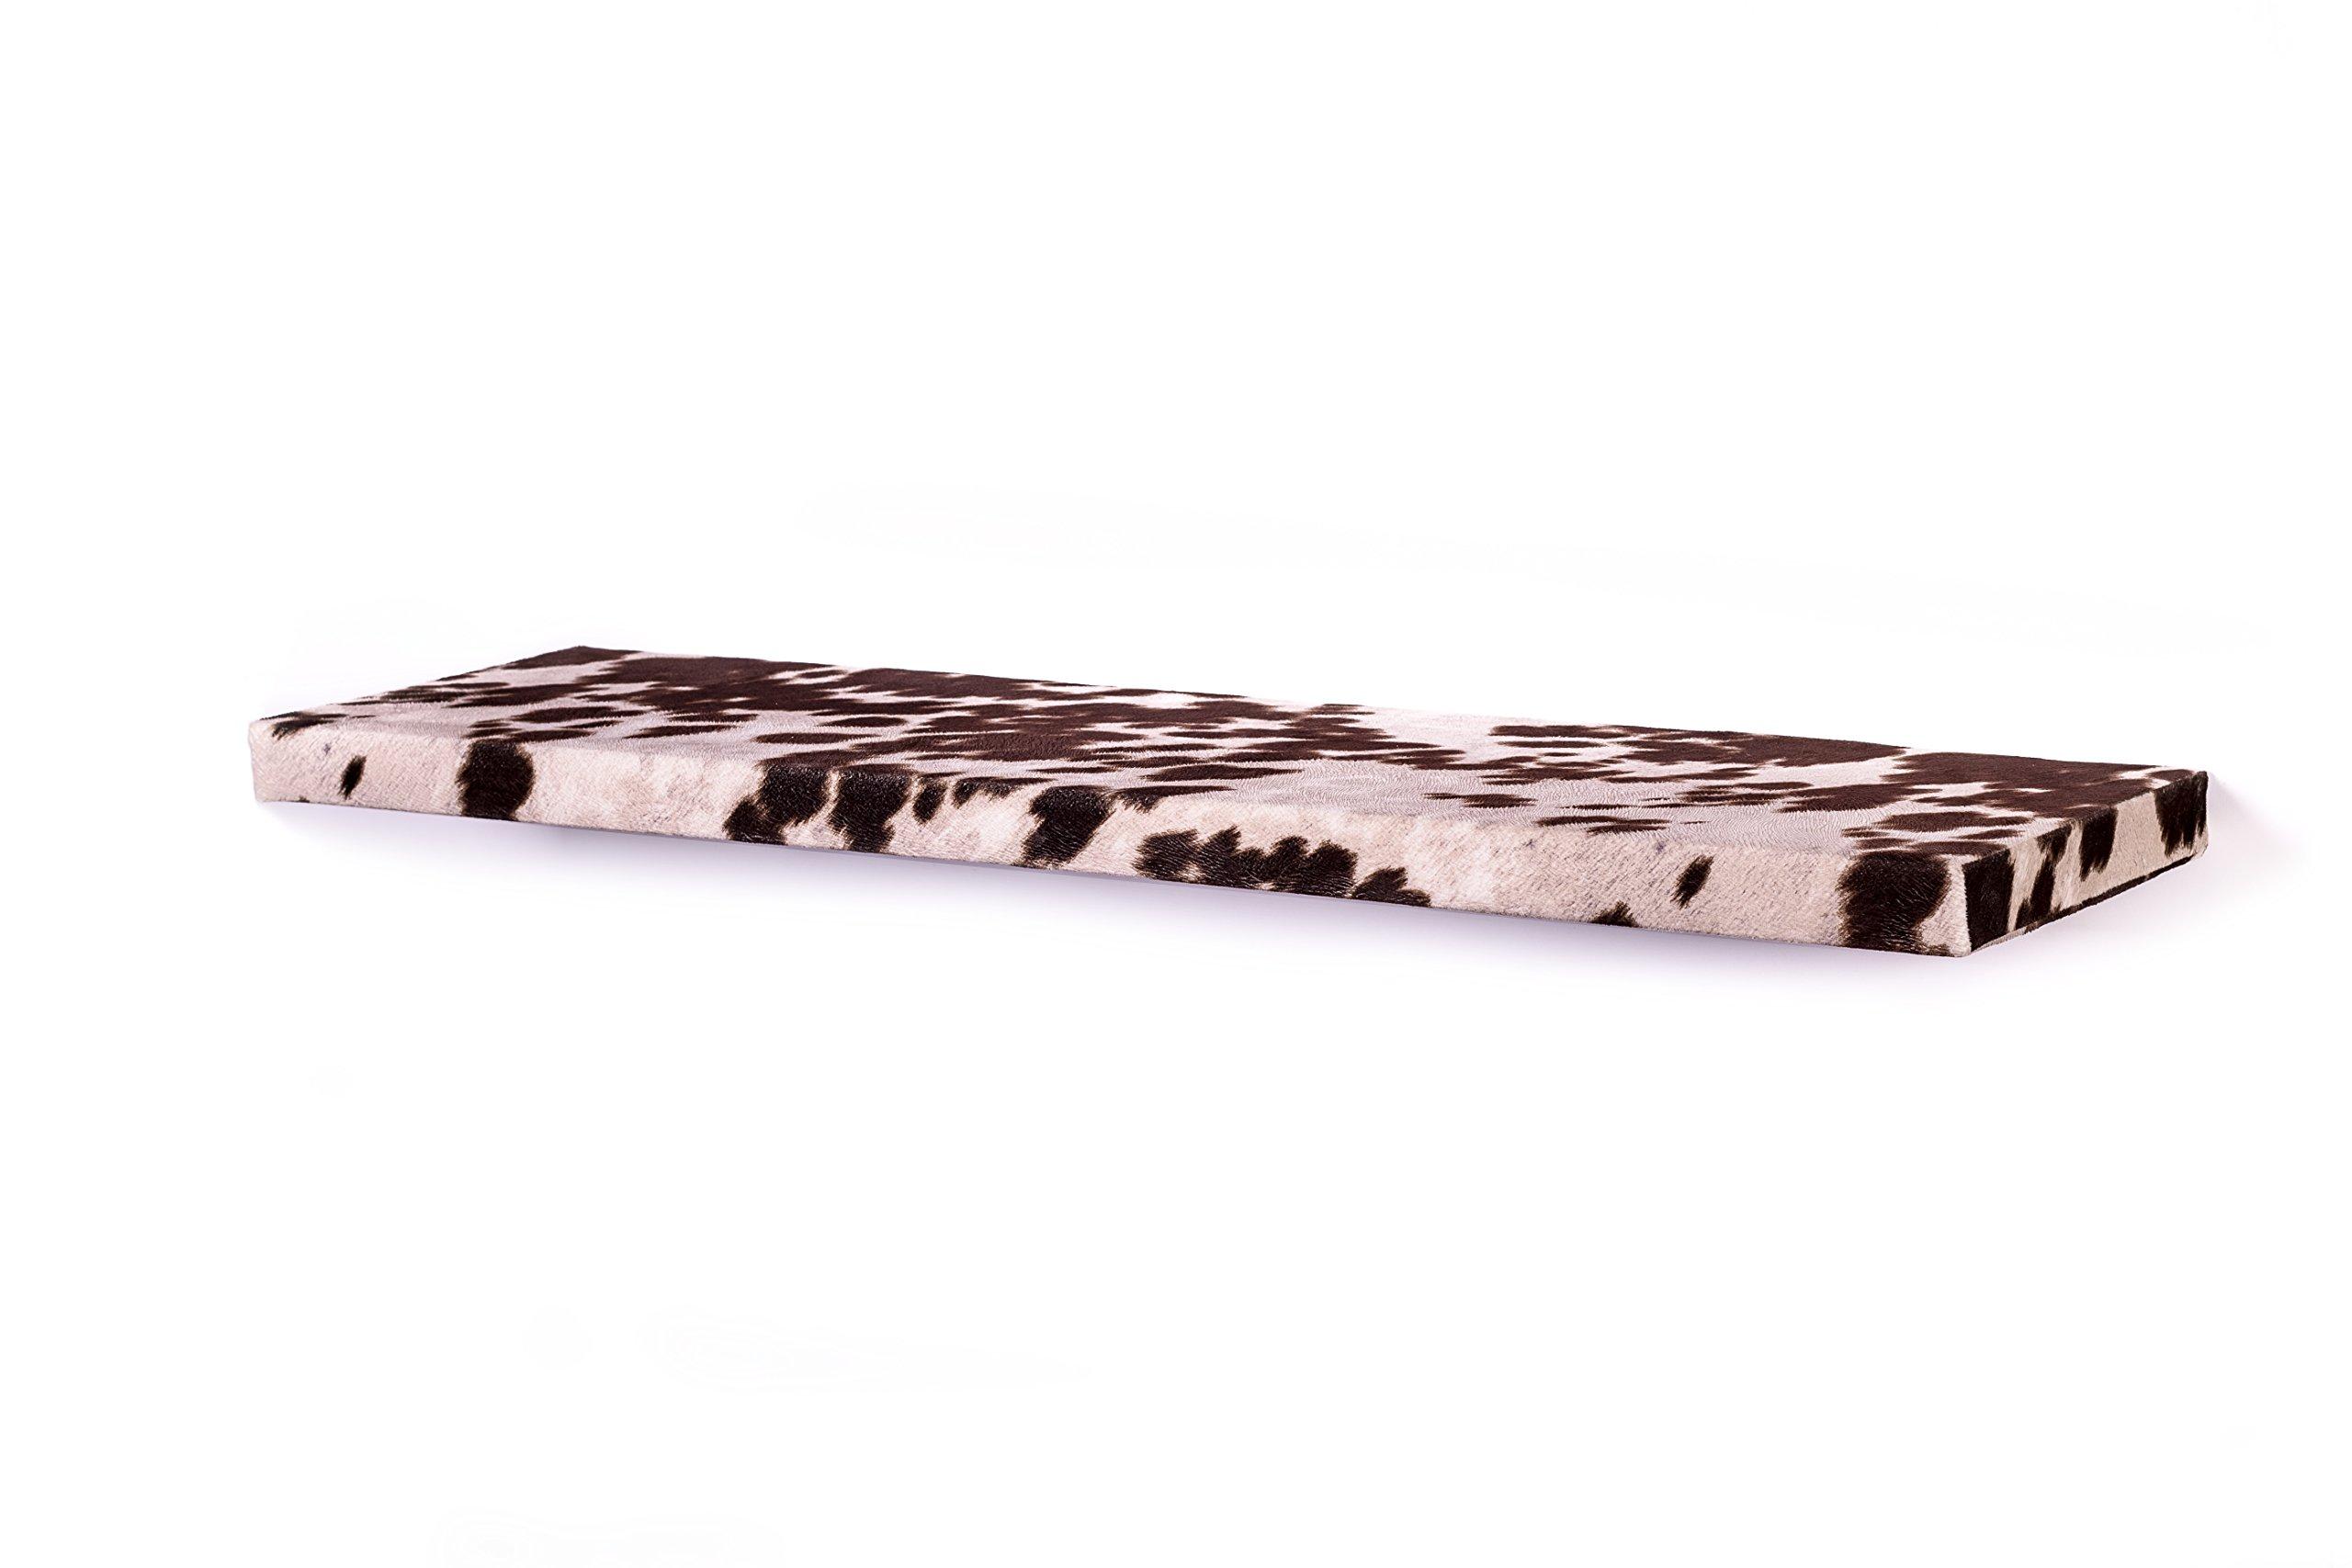 DAKODA LOVE 10'' Deep Cowhide Floating Shelves (Brown, 36'') by DAKODA LOVE (Image #3)